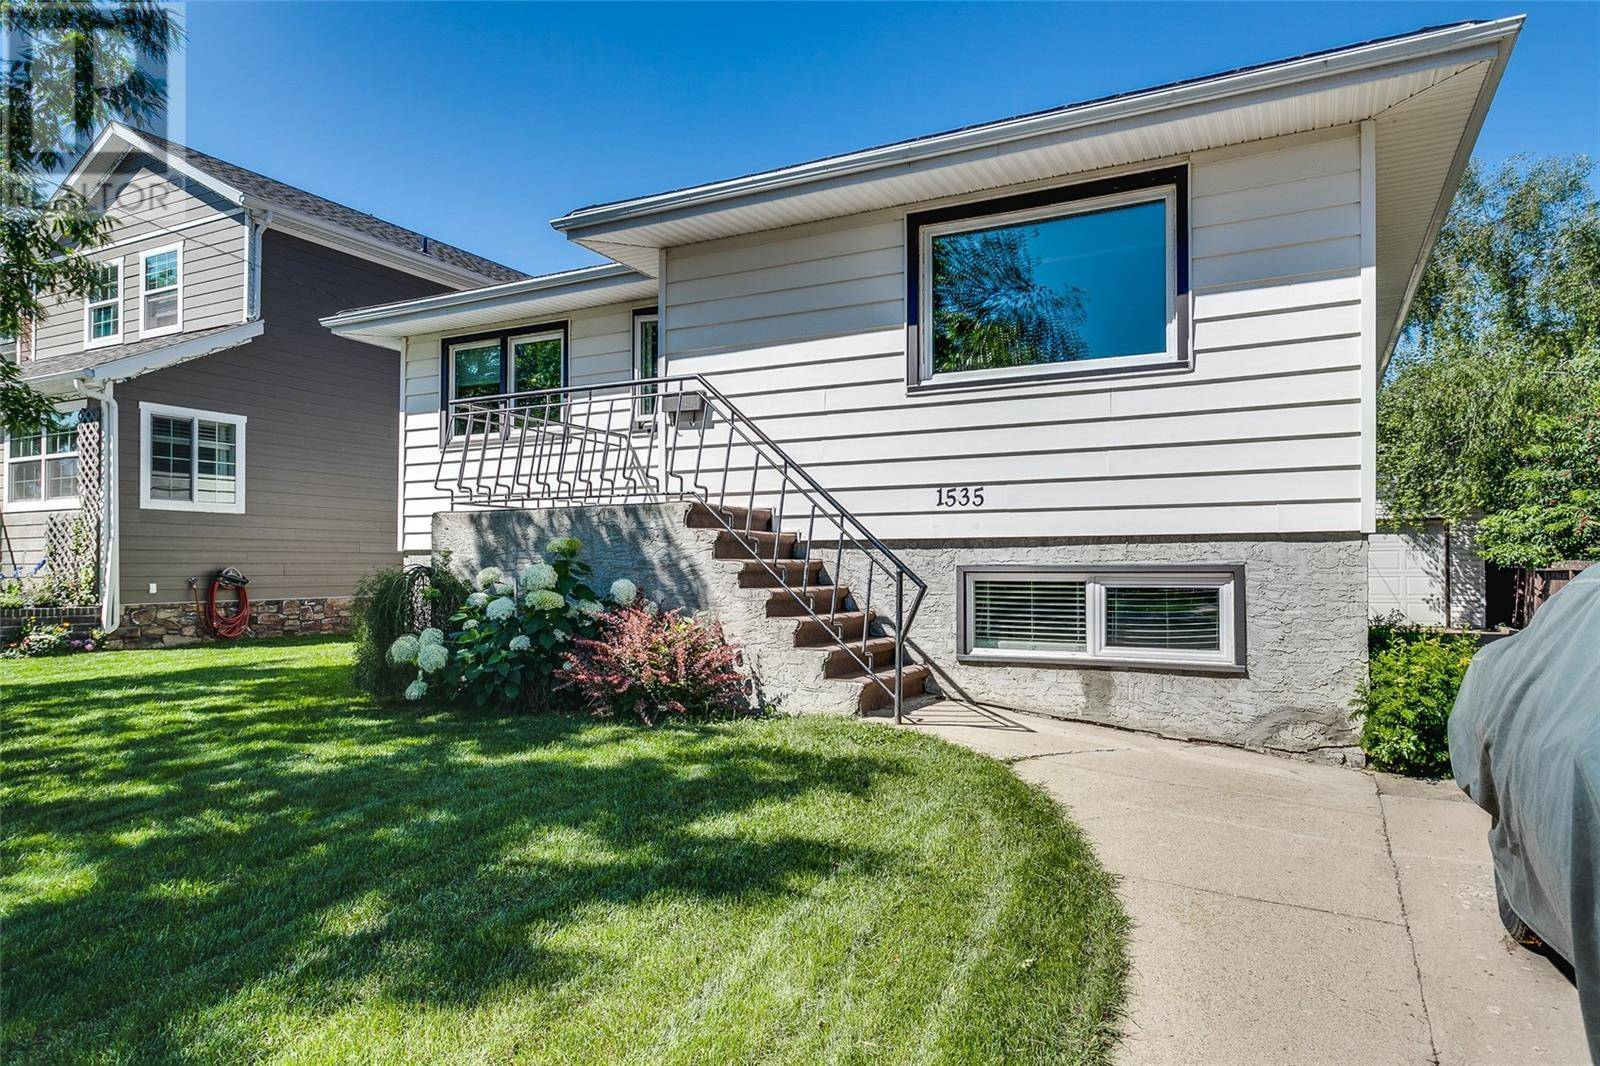 House for sale at 1535 Wales Ave Saskatoon Saskatchewan - MLS: SK797083